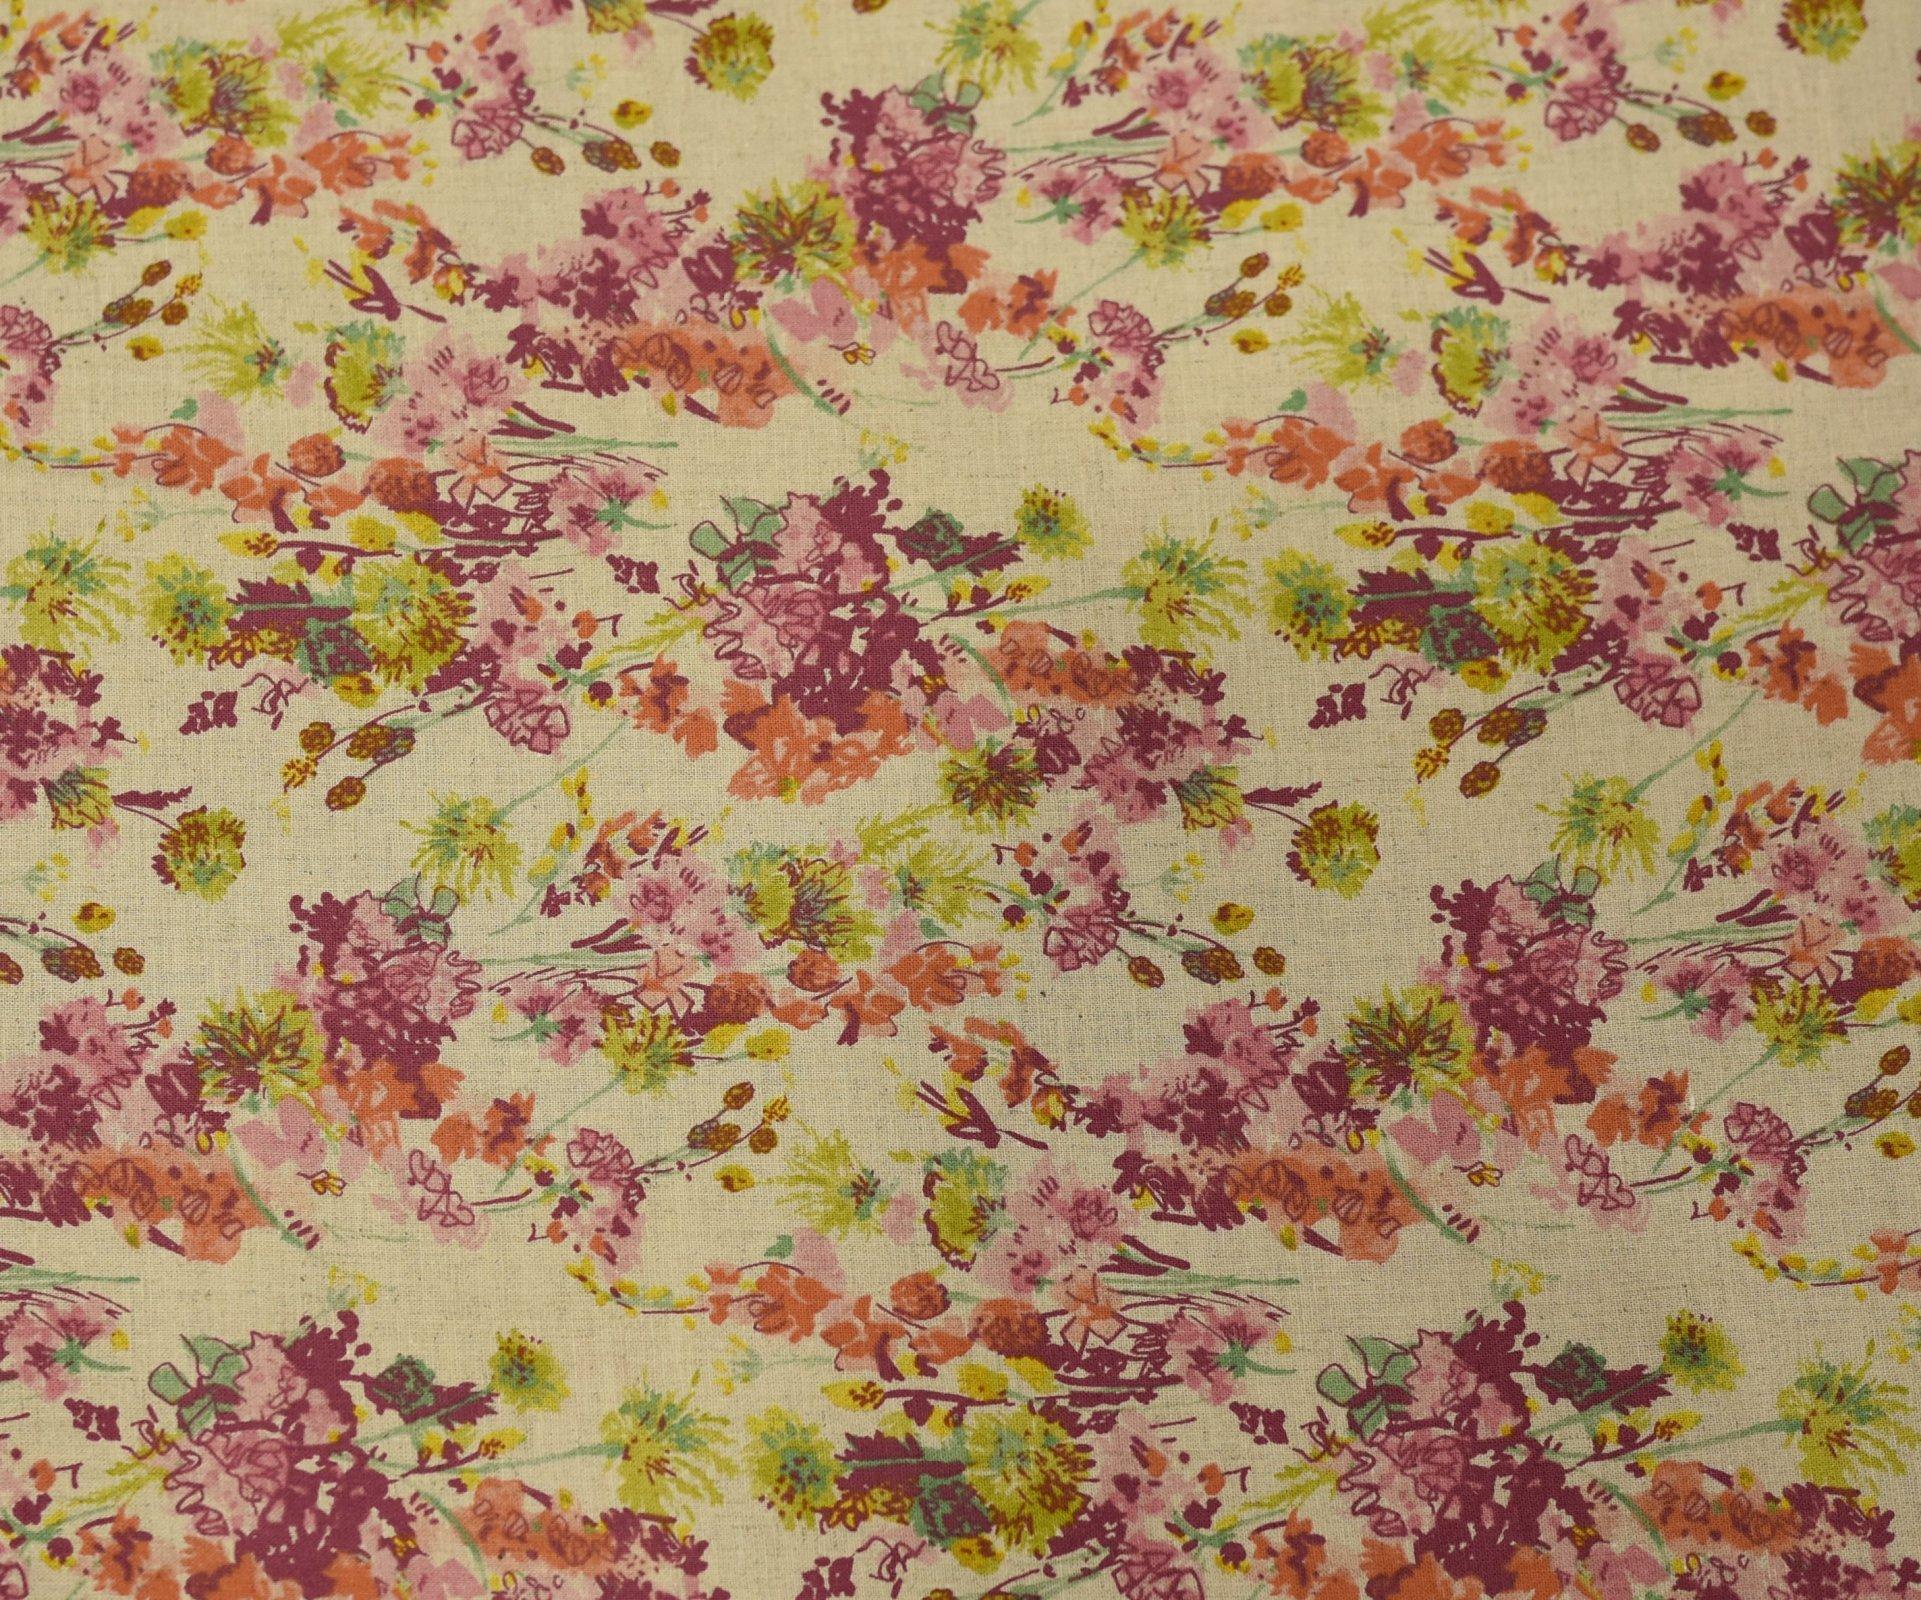 Hokkoh Fabric - Cotton/Linen - Colourful Bunch